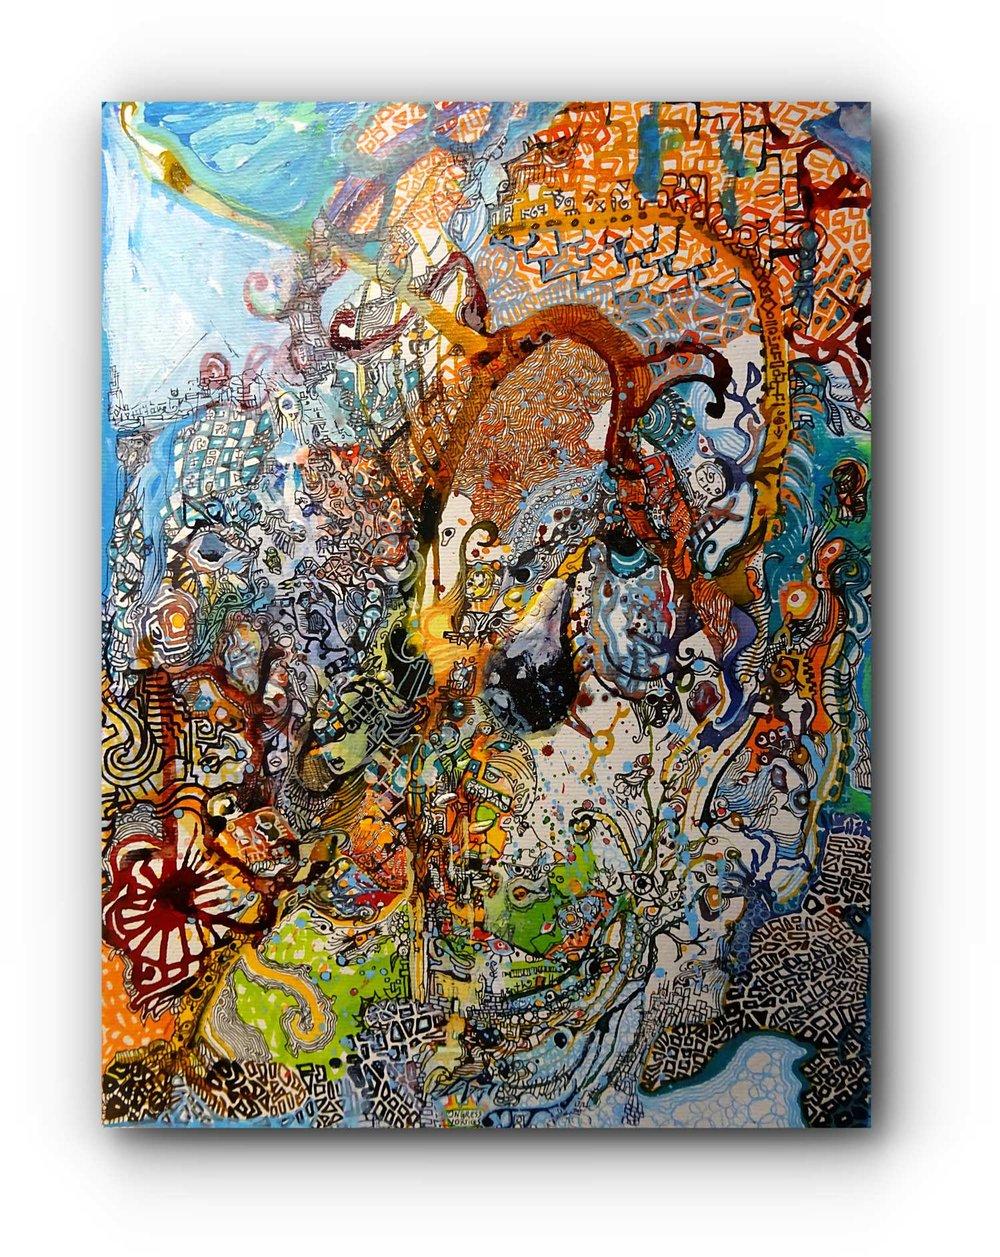 painting-progress-blossoming-23-artist-duo-ingress-vortices.jpg